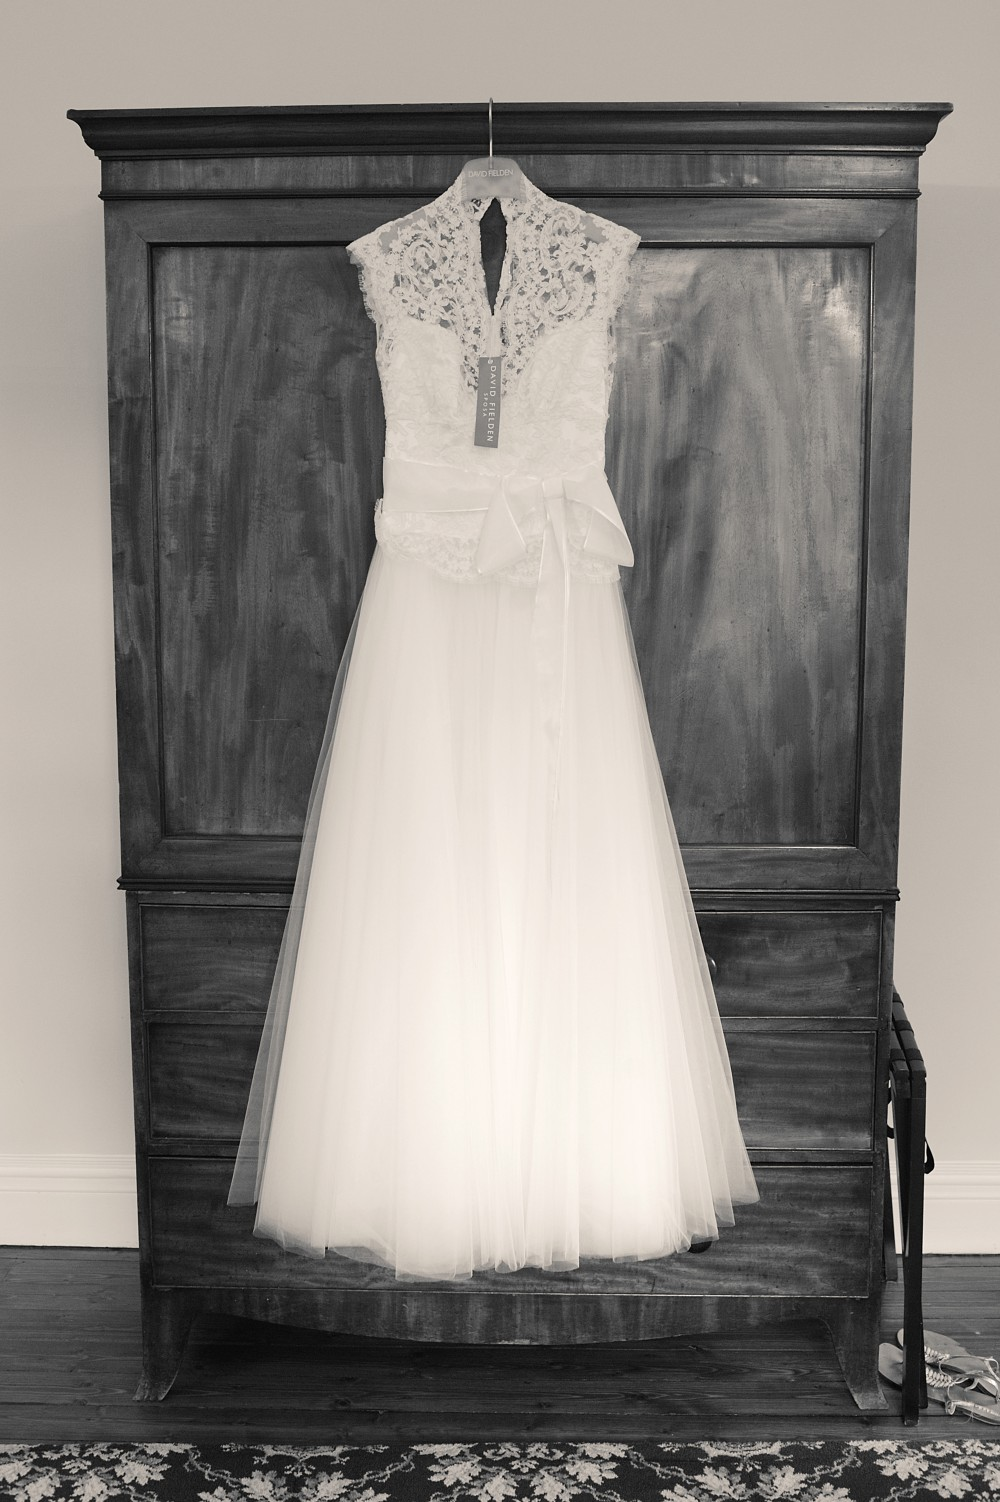 David Fielden Grace Kelly 3706 - Used Wedding Dresses - Stillwhite